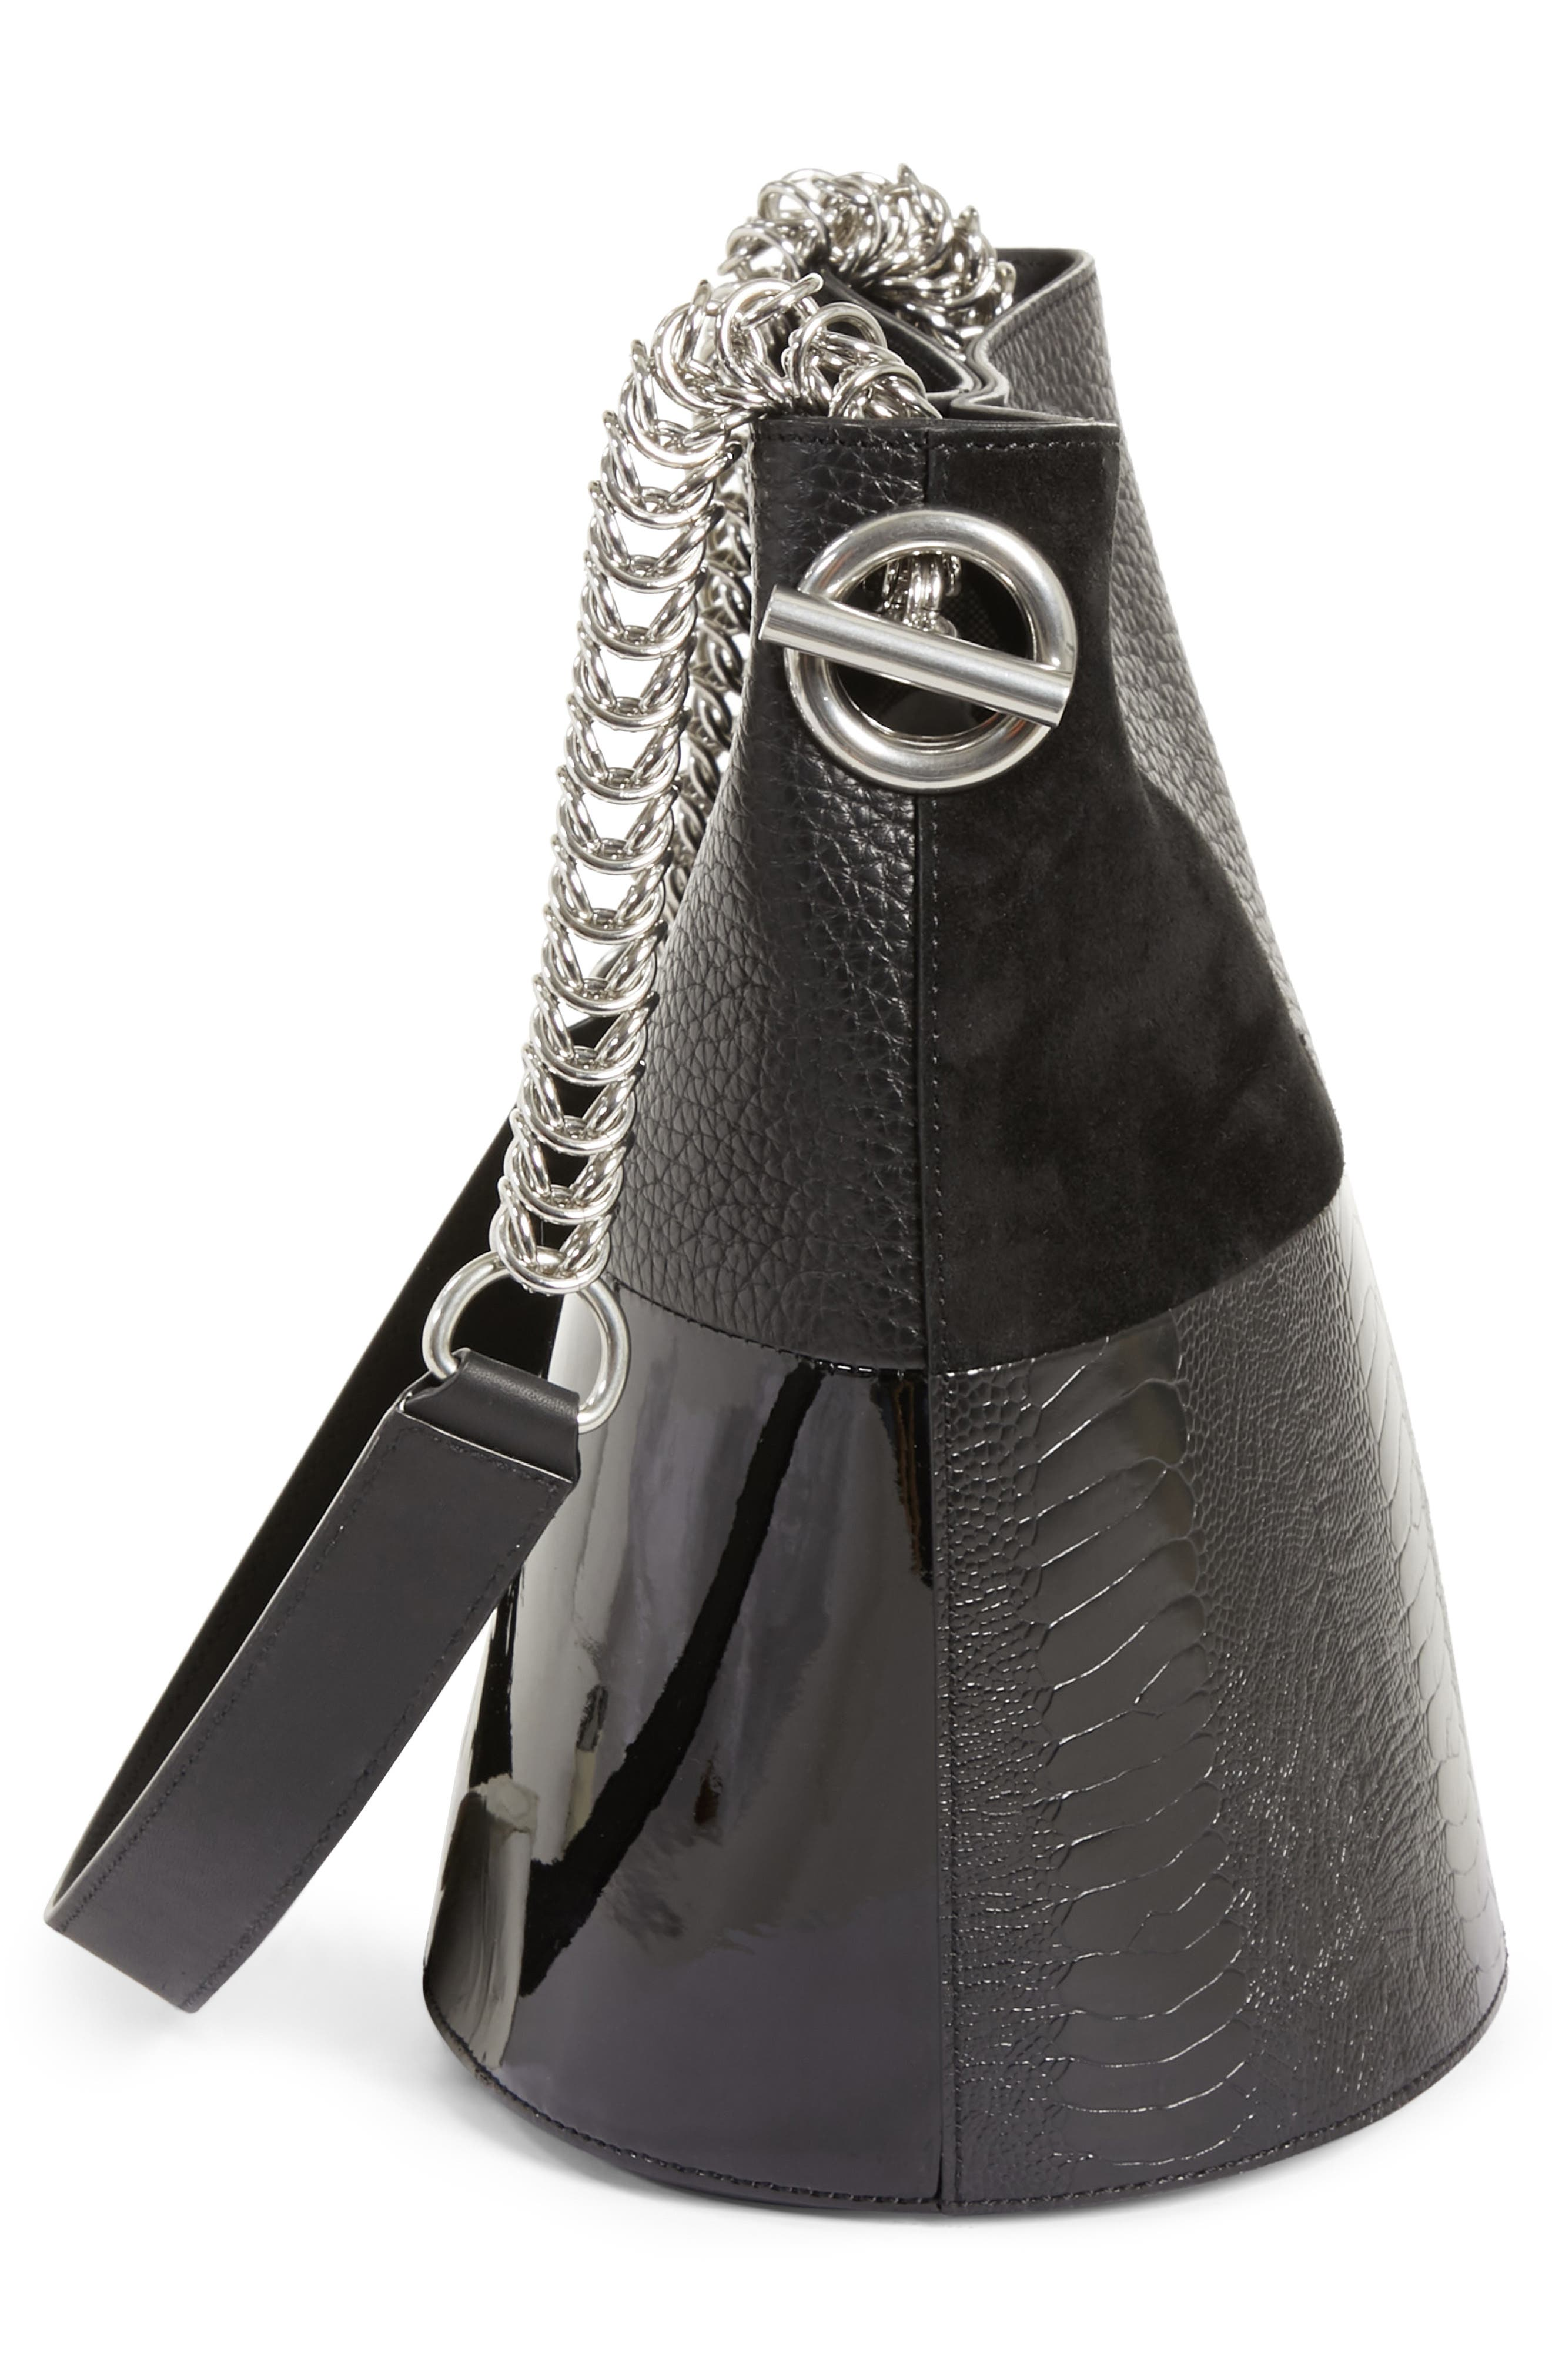 Genesis Patchwork Leather Bucket Bag,                             Alternate thumbnail 5, color,                             001